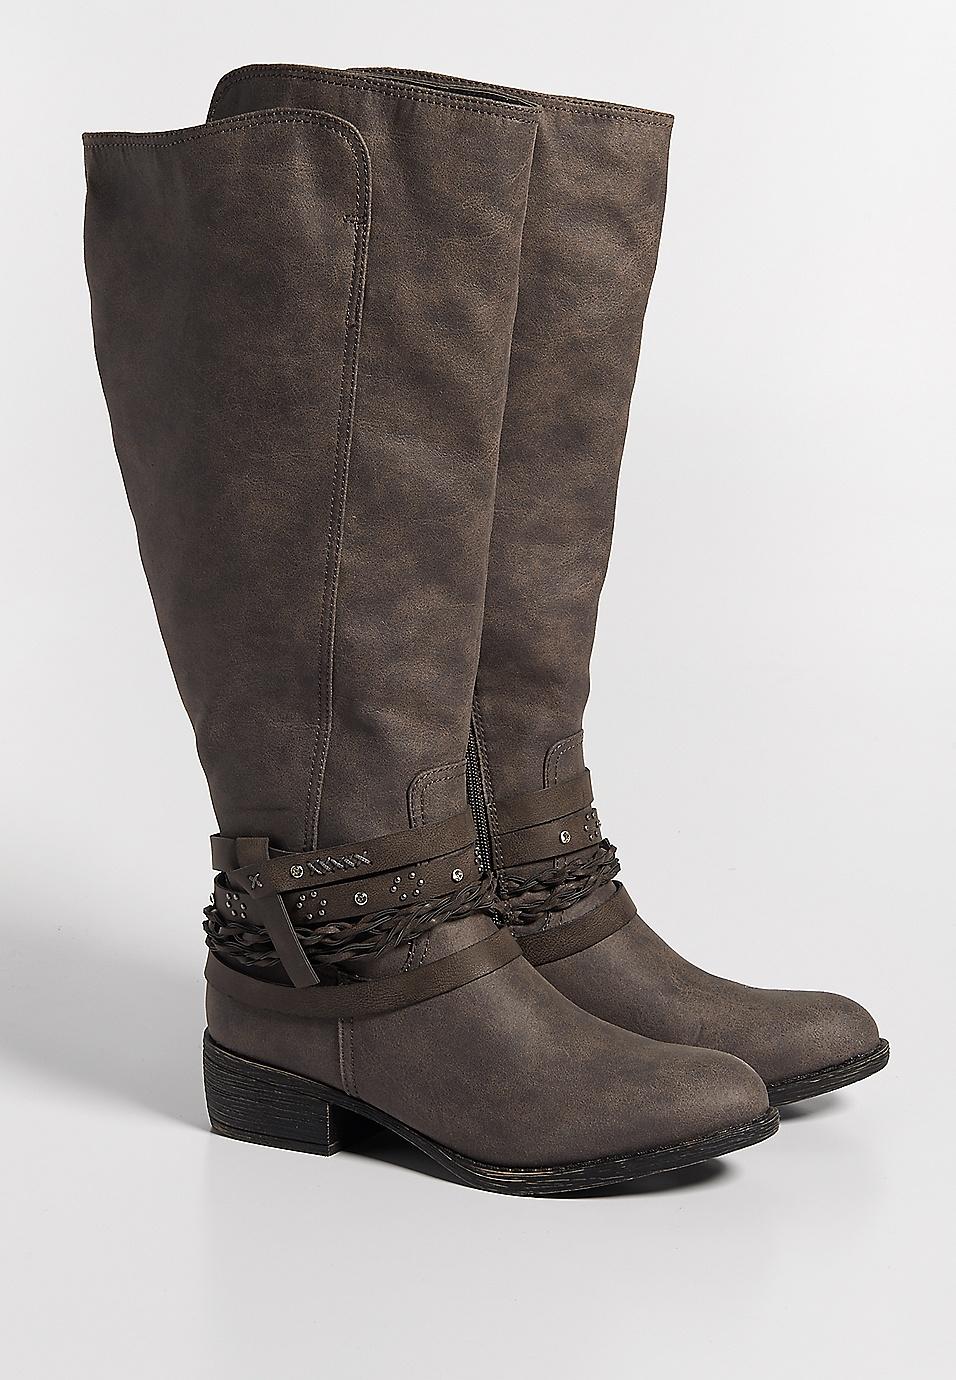 b77f52bfcc97 Gretchen wide calf tall boot